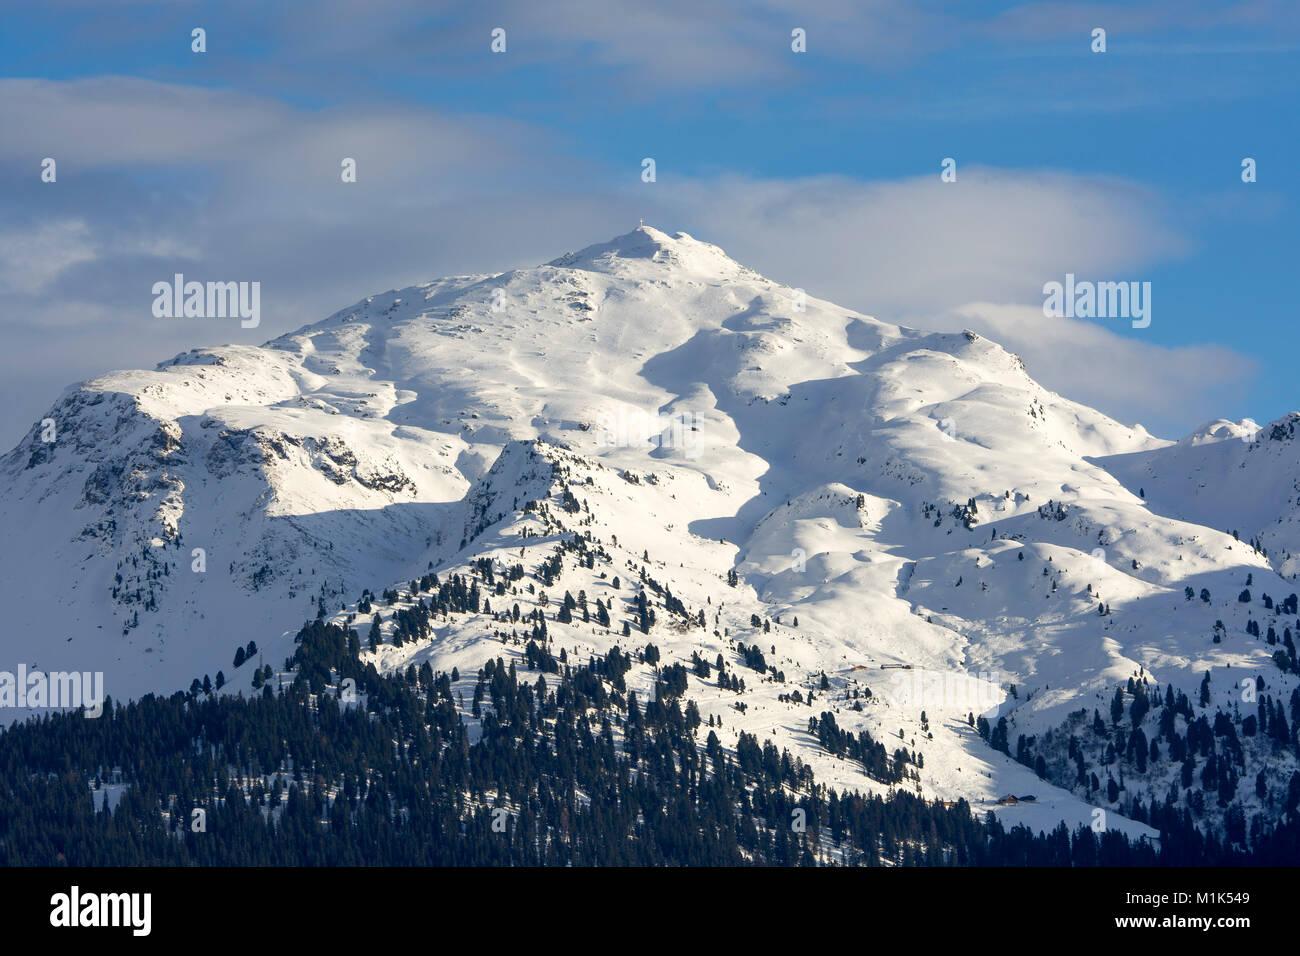 Snow-capped peak of the Gilfert in winter, Tux Alps, Tyrol, Austria - Stock Image